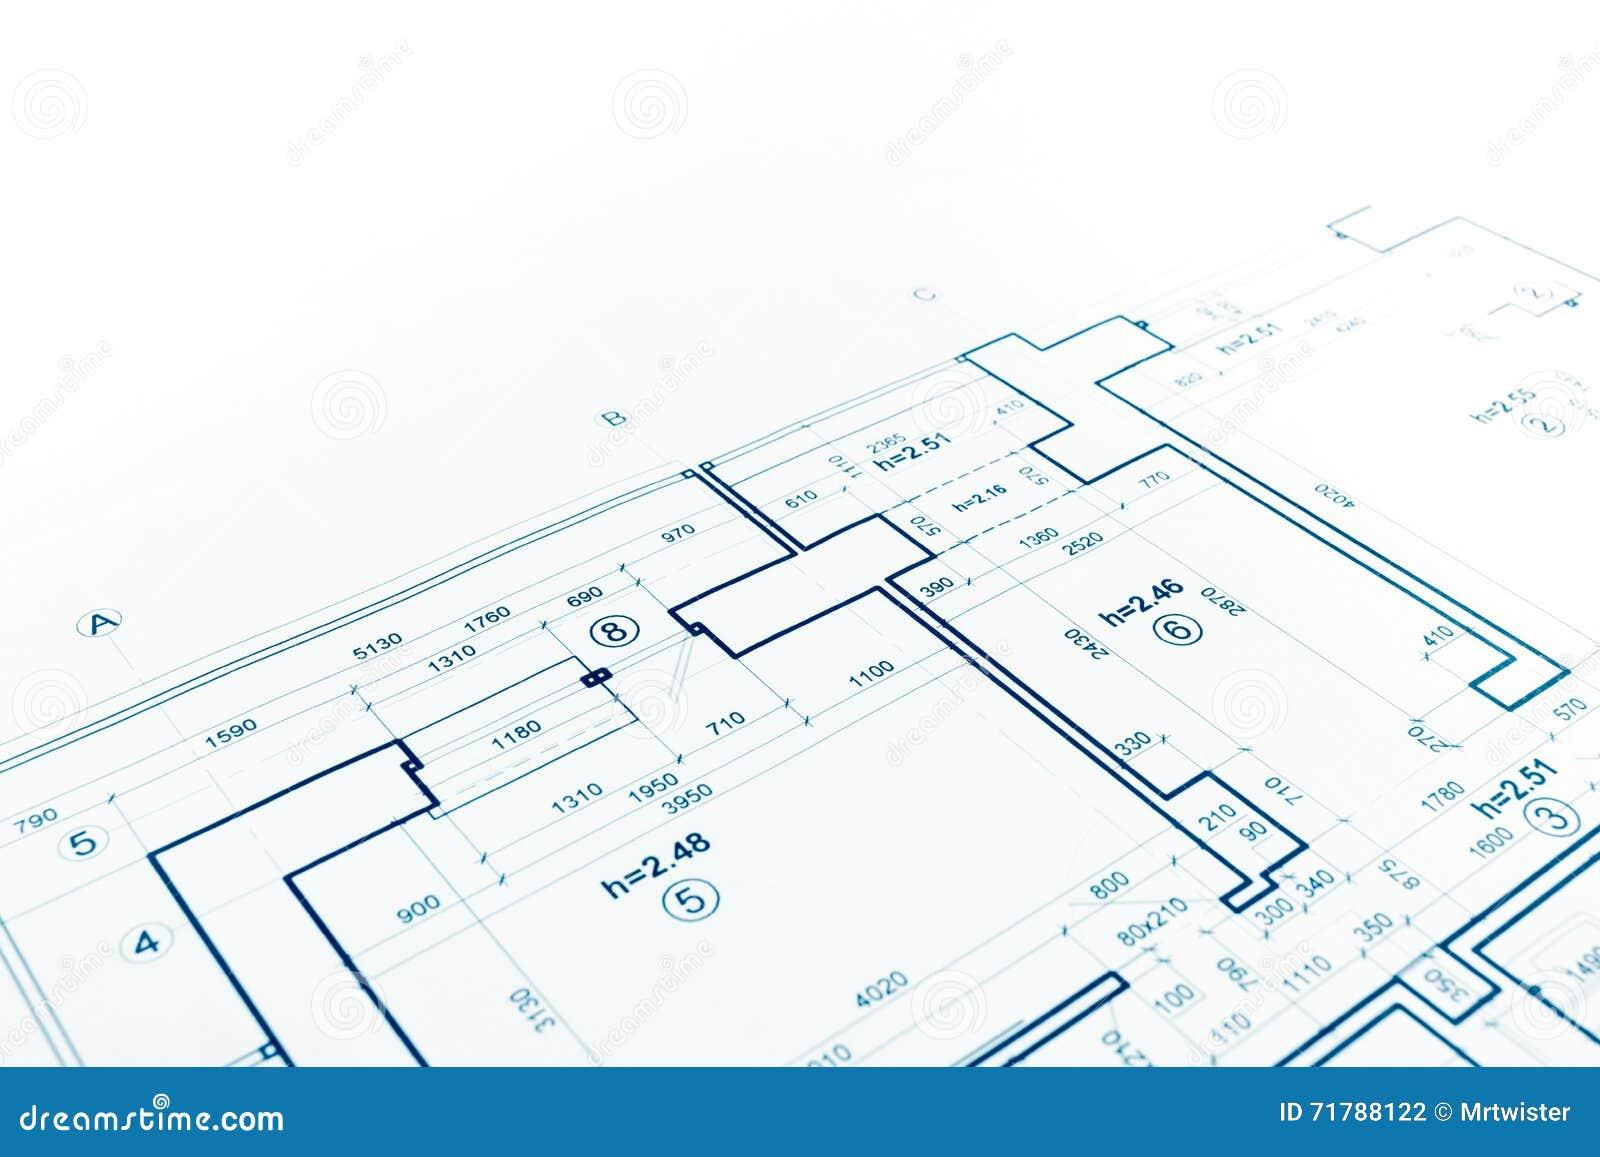 floor plan blueprint blueprints background architecture drawin